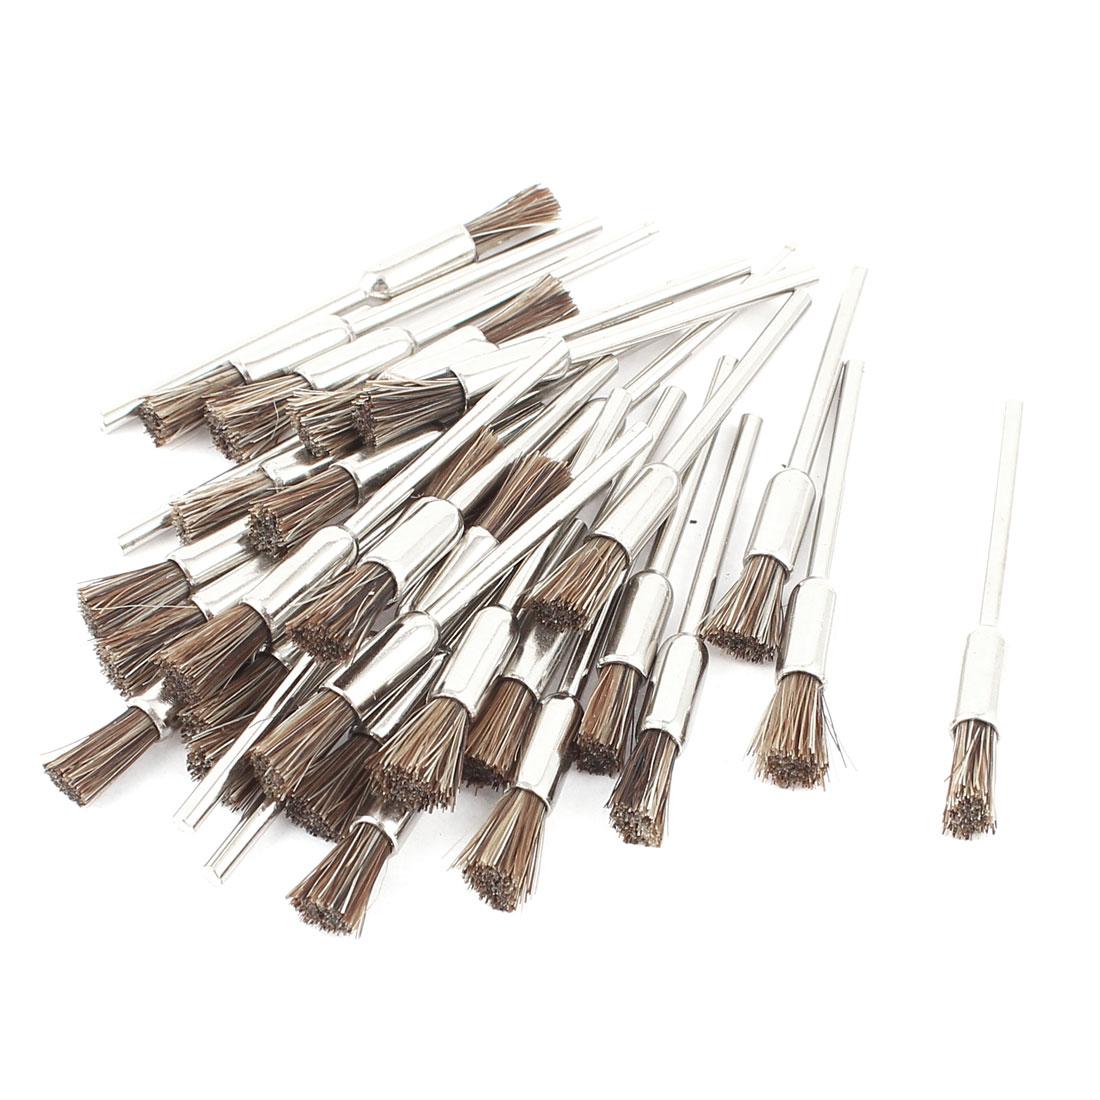 2 3mm 2 32 mandrel brown bristle pen shape brushes